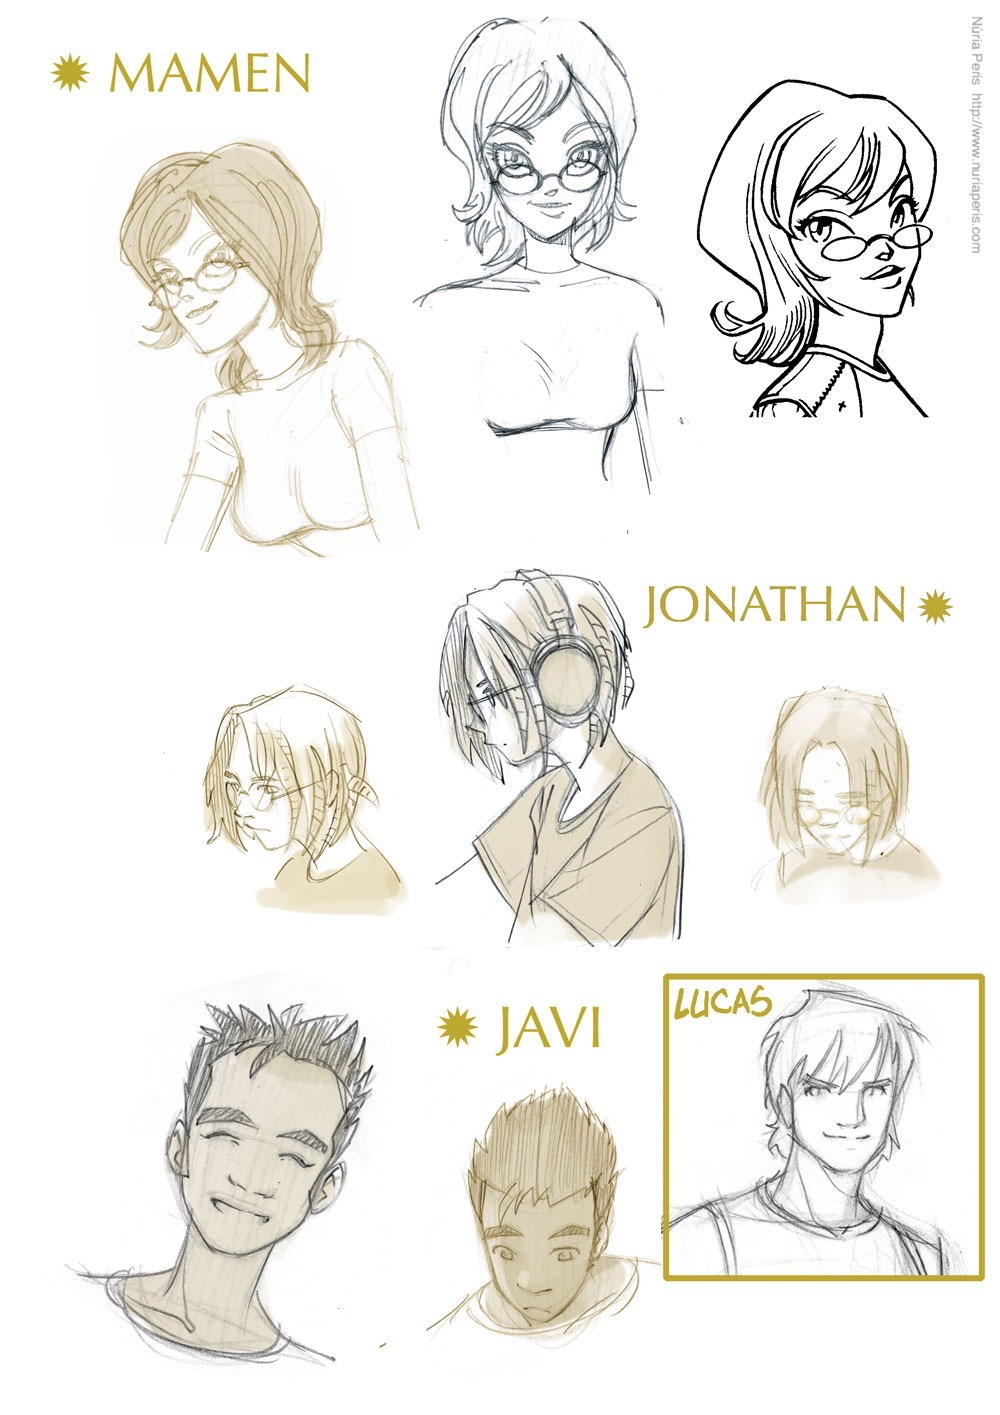 Personajes_M1M_01.jpg